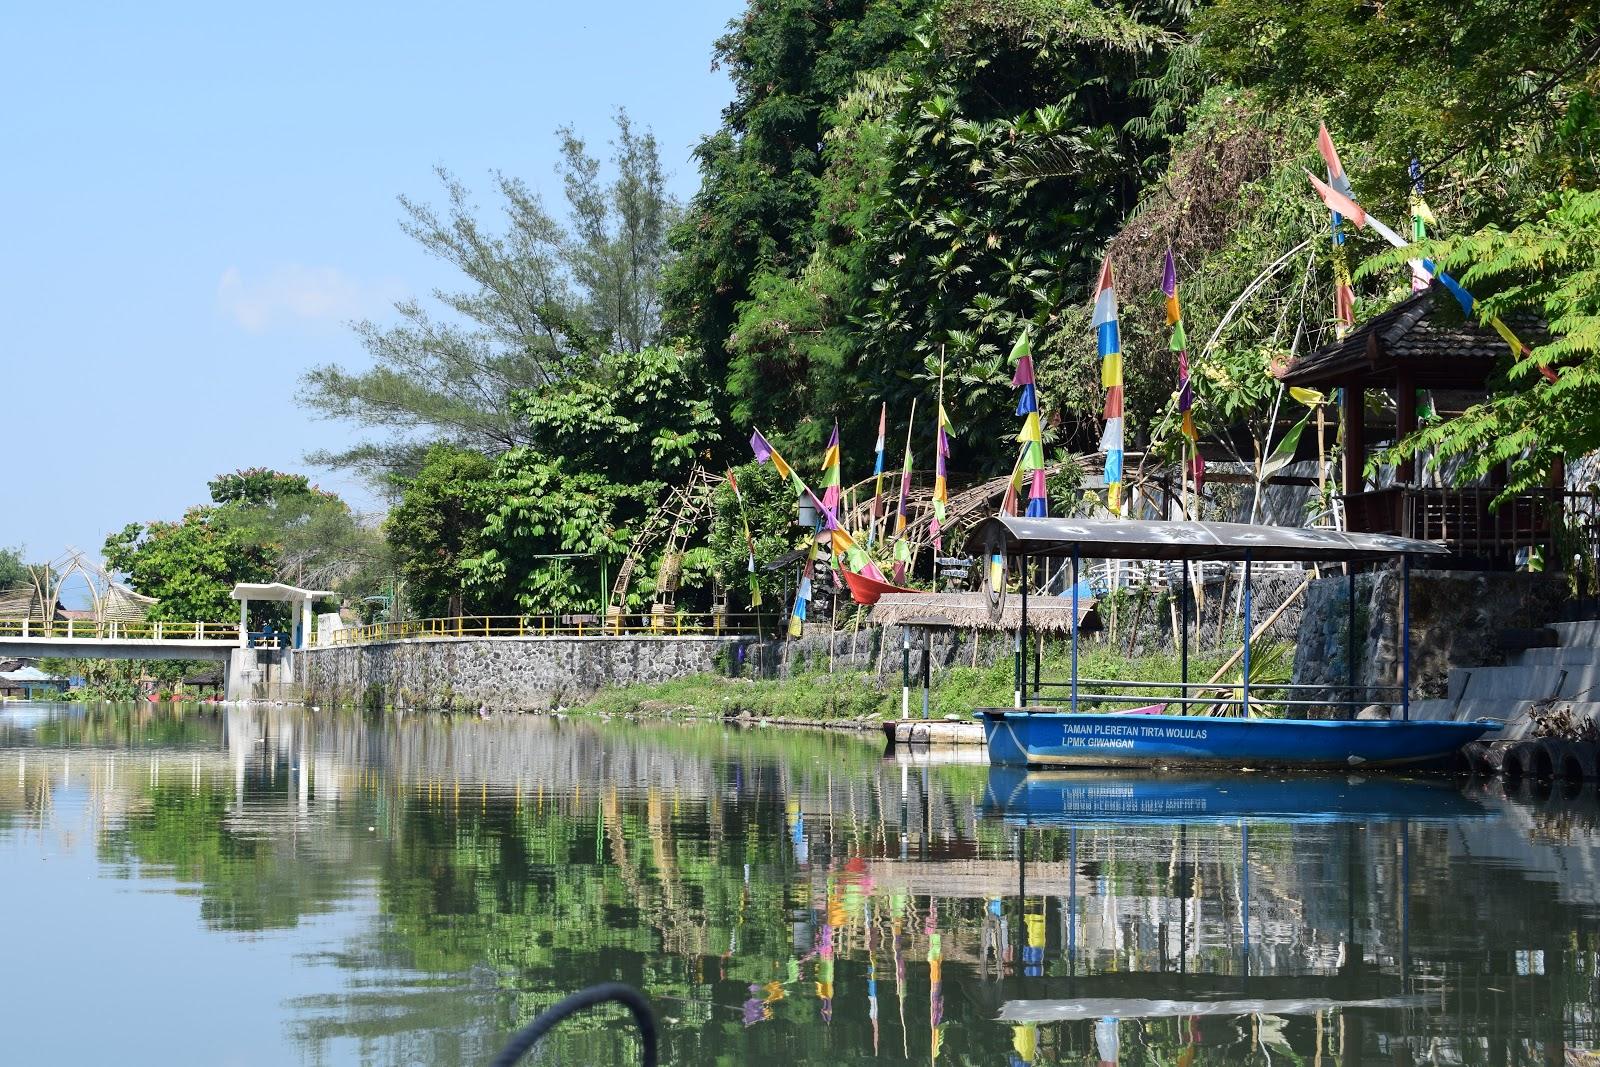 wisata perahu di jogja Wisata Air Taman Tirta Wolulas Kali Gajah Wong Giwangan